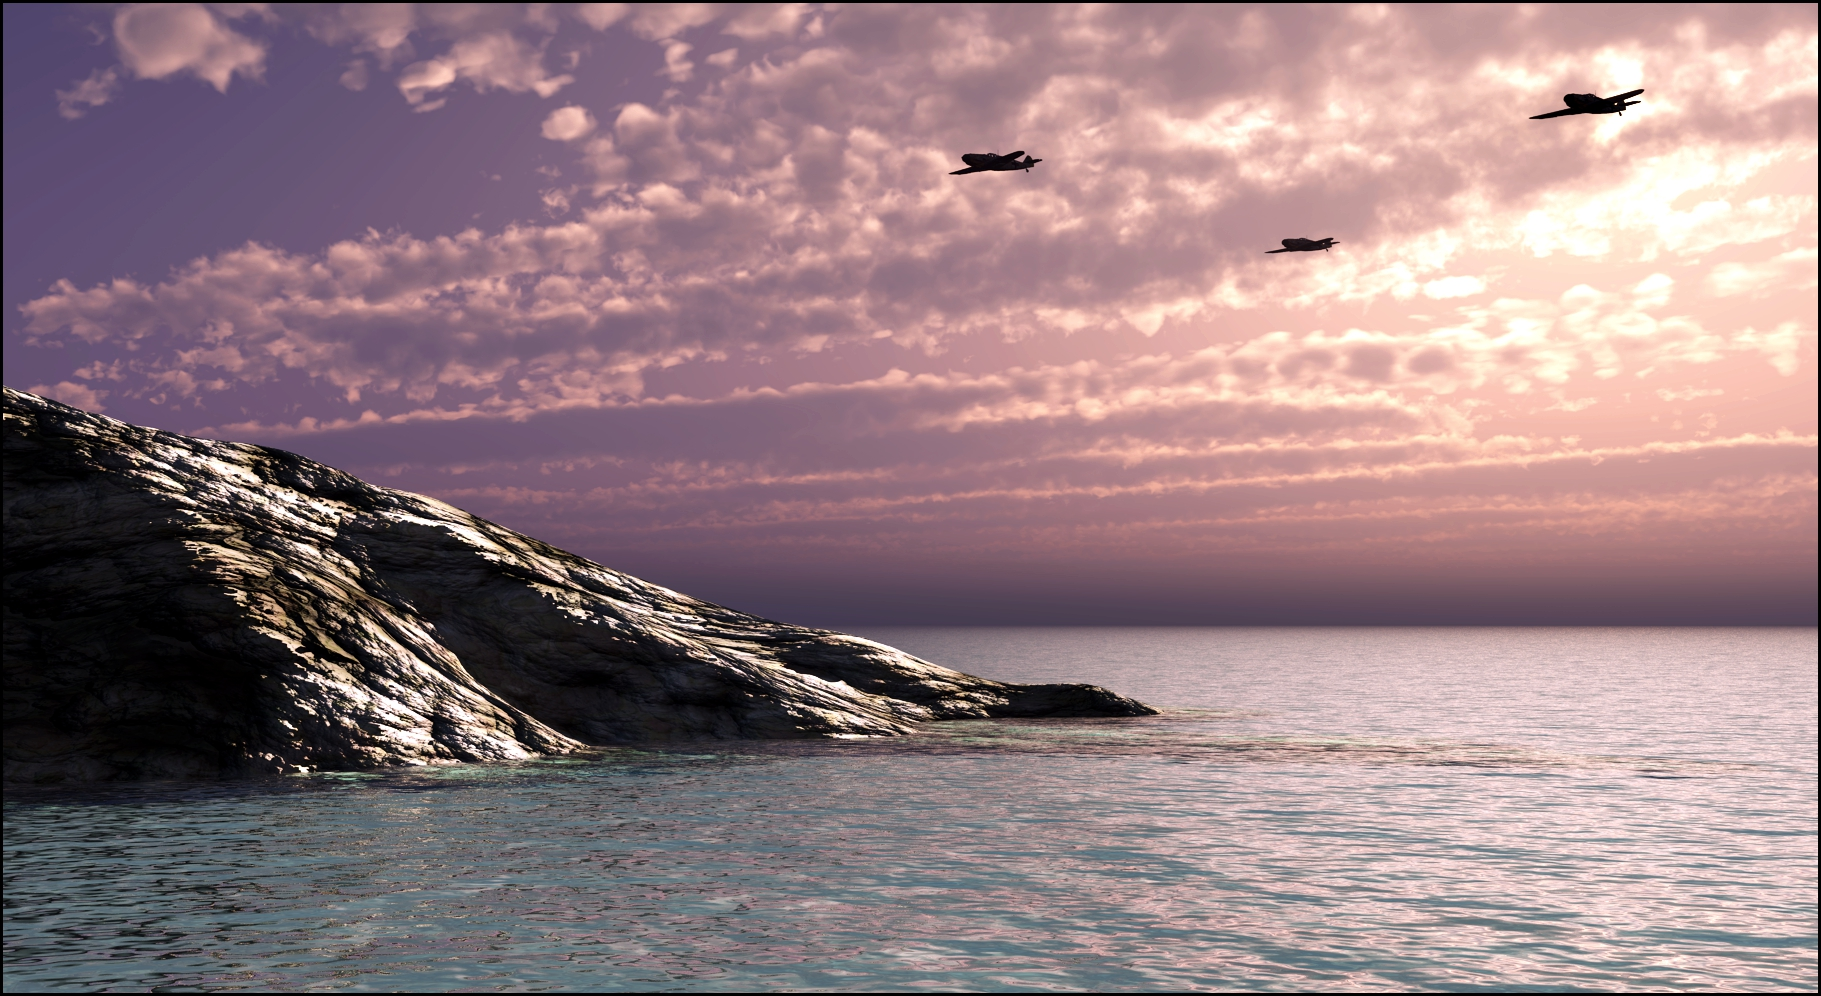 Crossing The Channel At Dawn by ClovisLuik